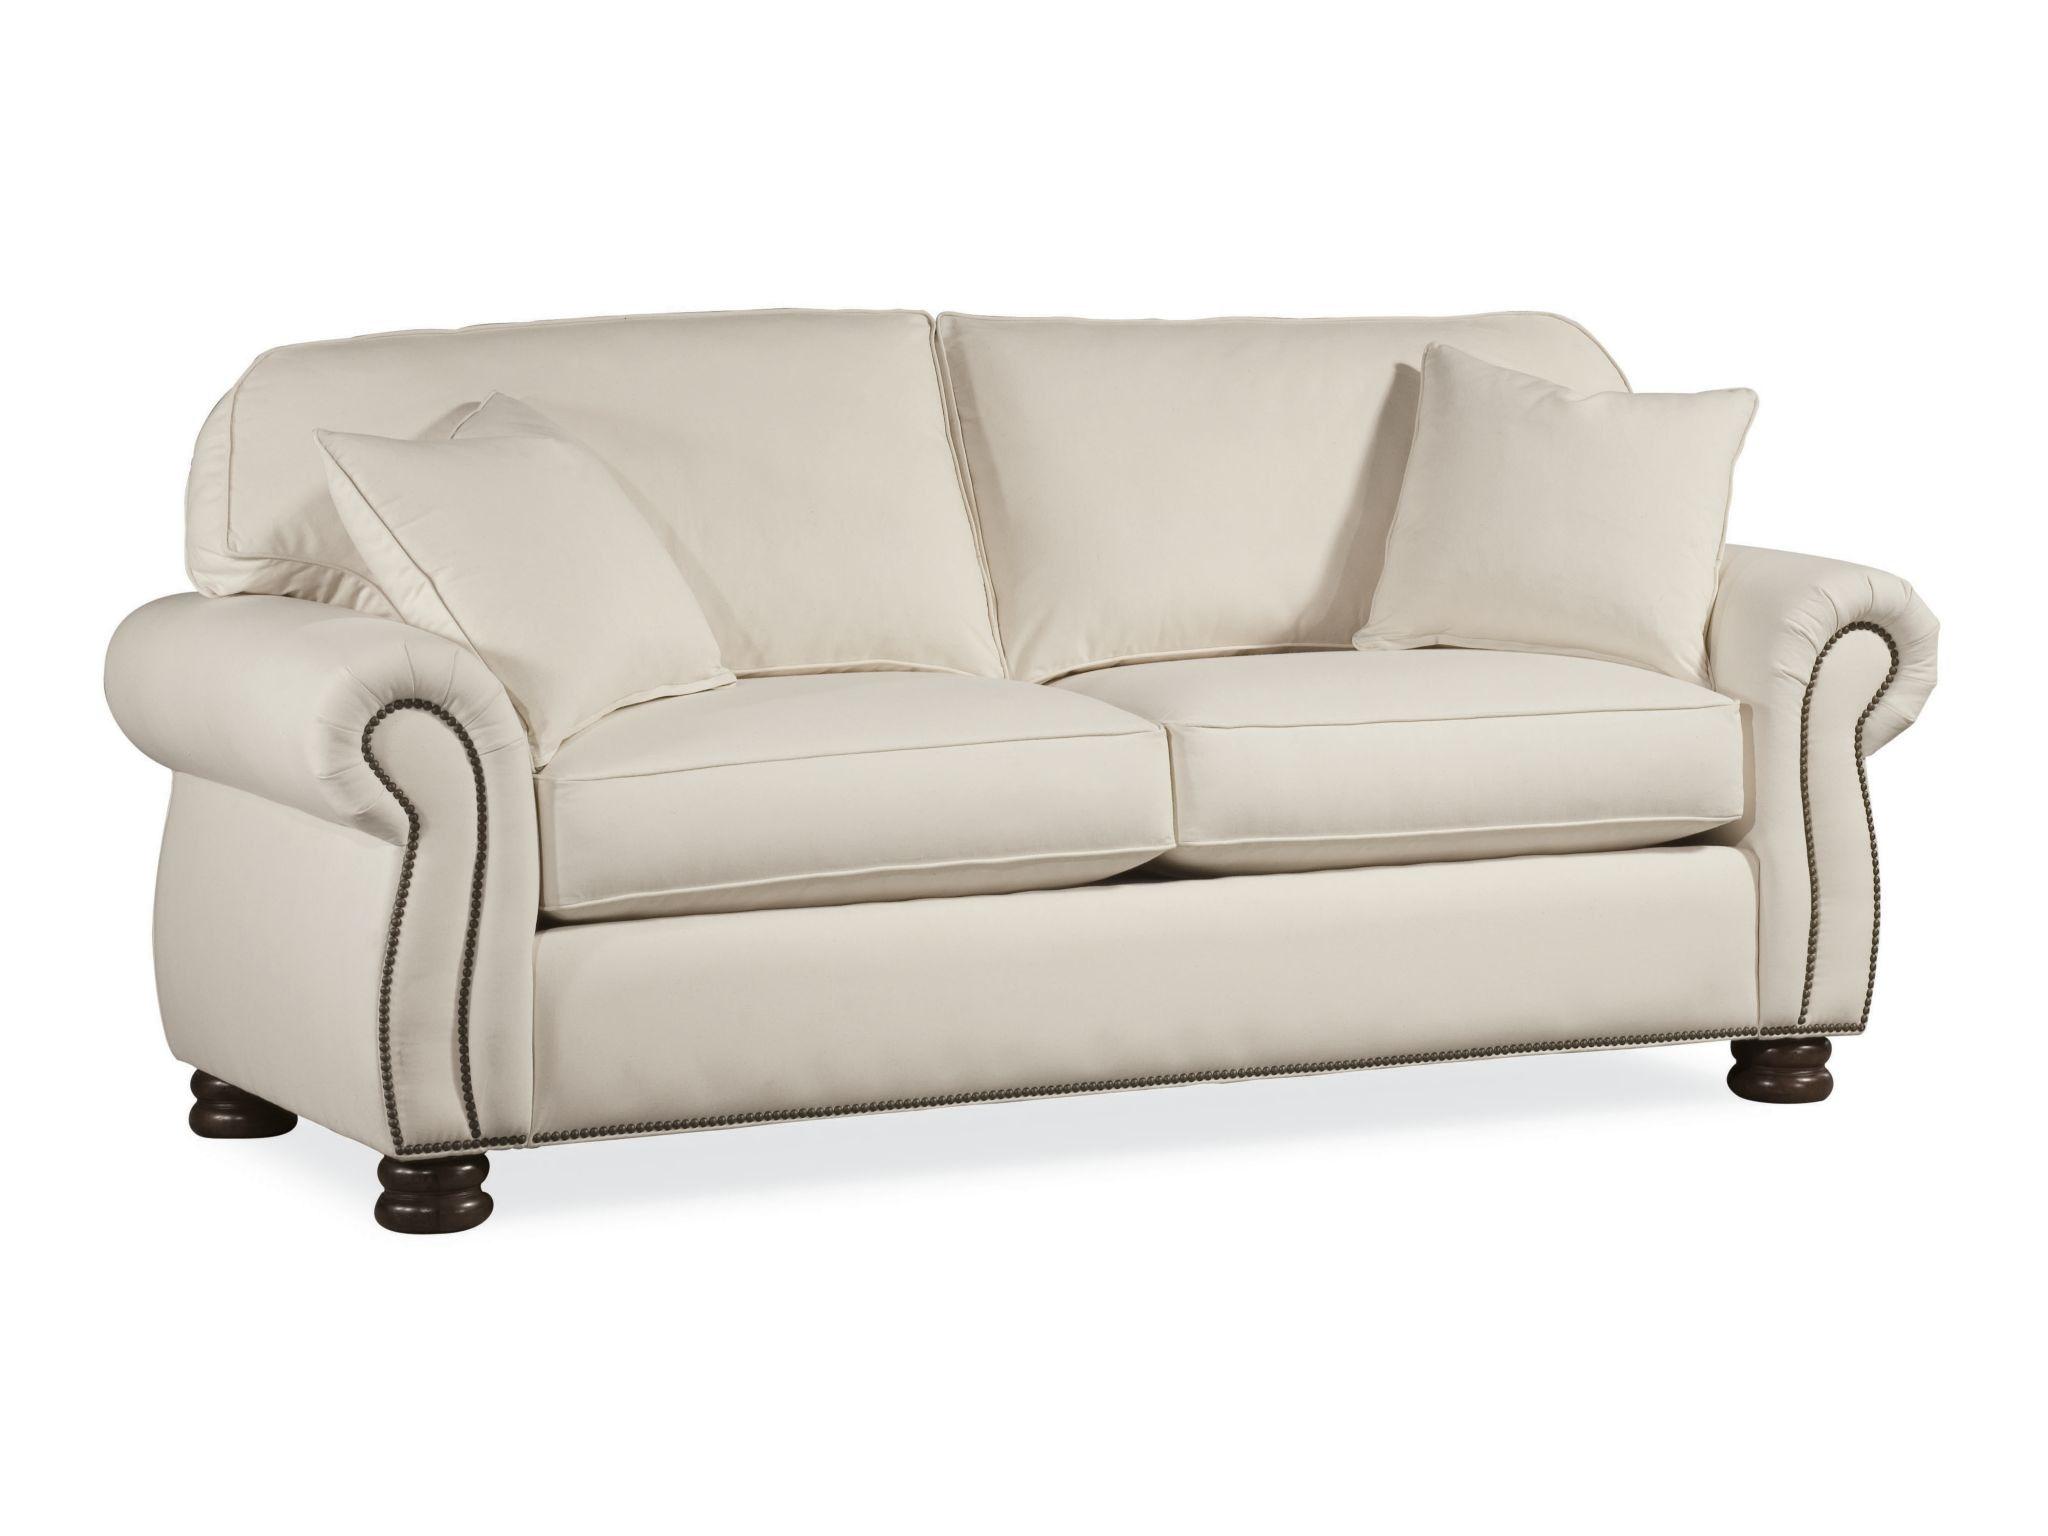 Thomasville Benjamin 2 Seat Sofa 1461 11